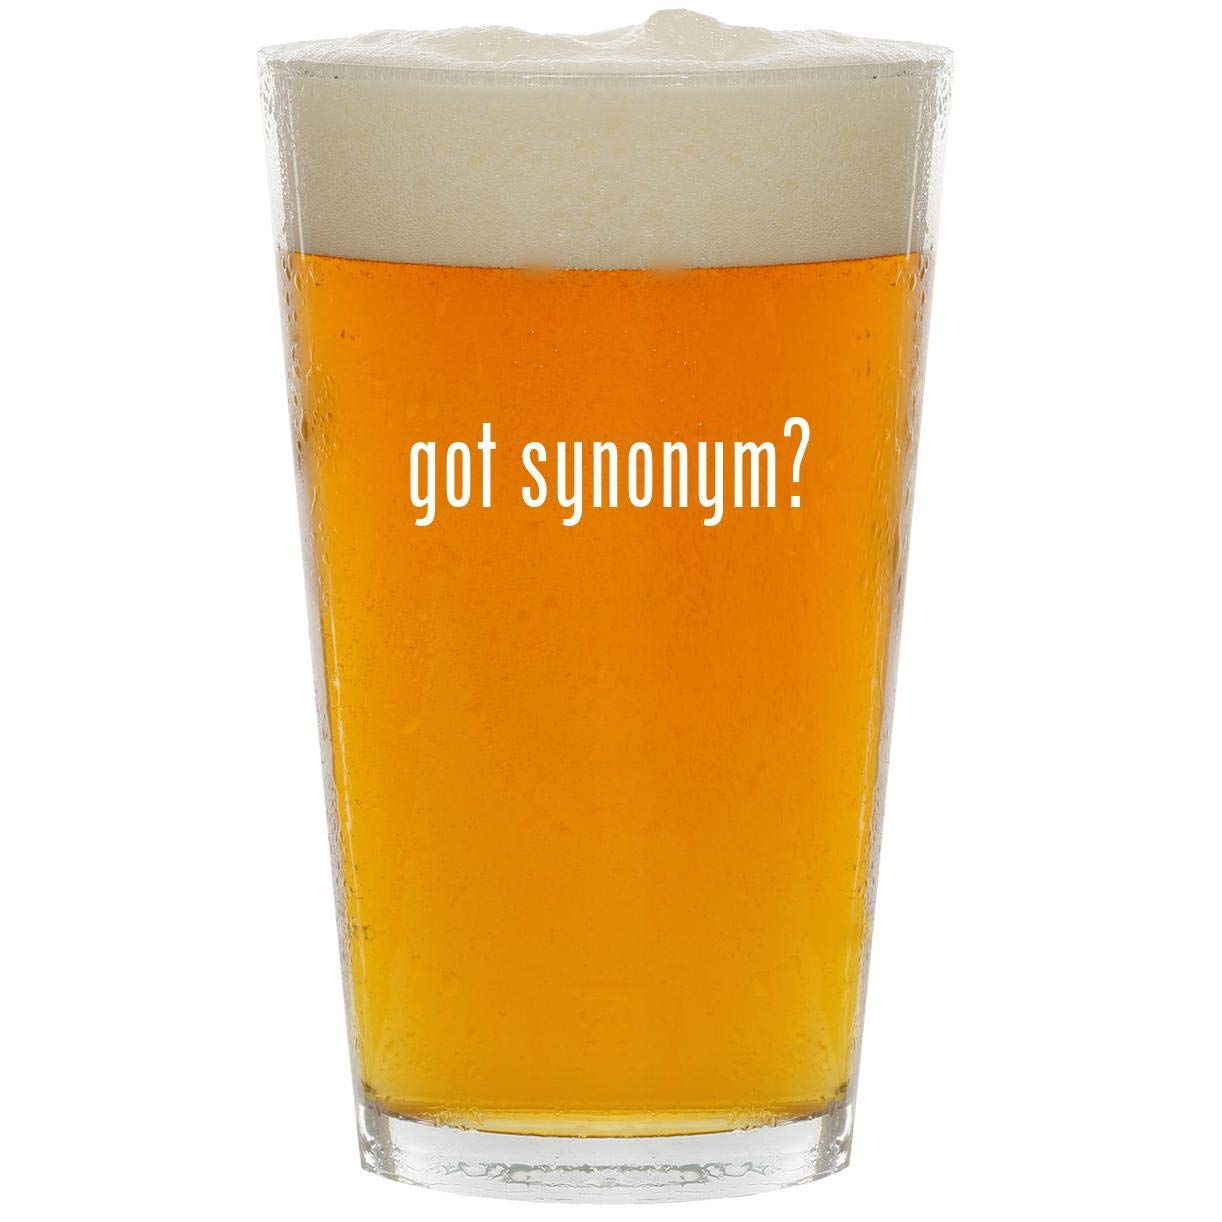 got synonym? - Glass 16oz Beer Pint